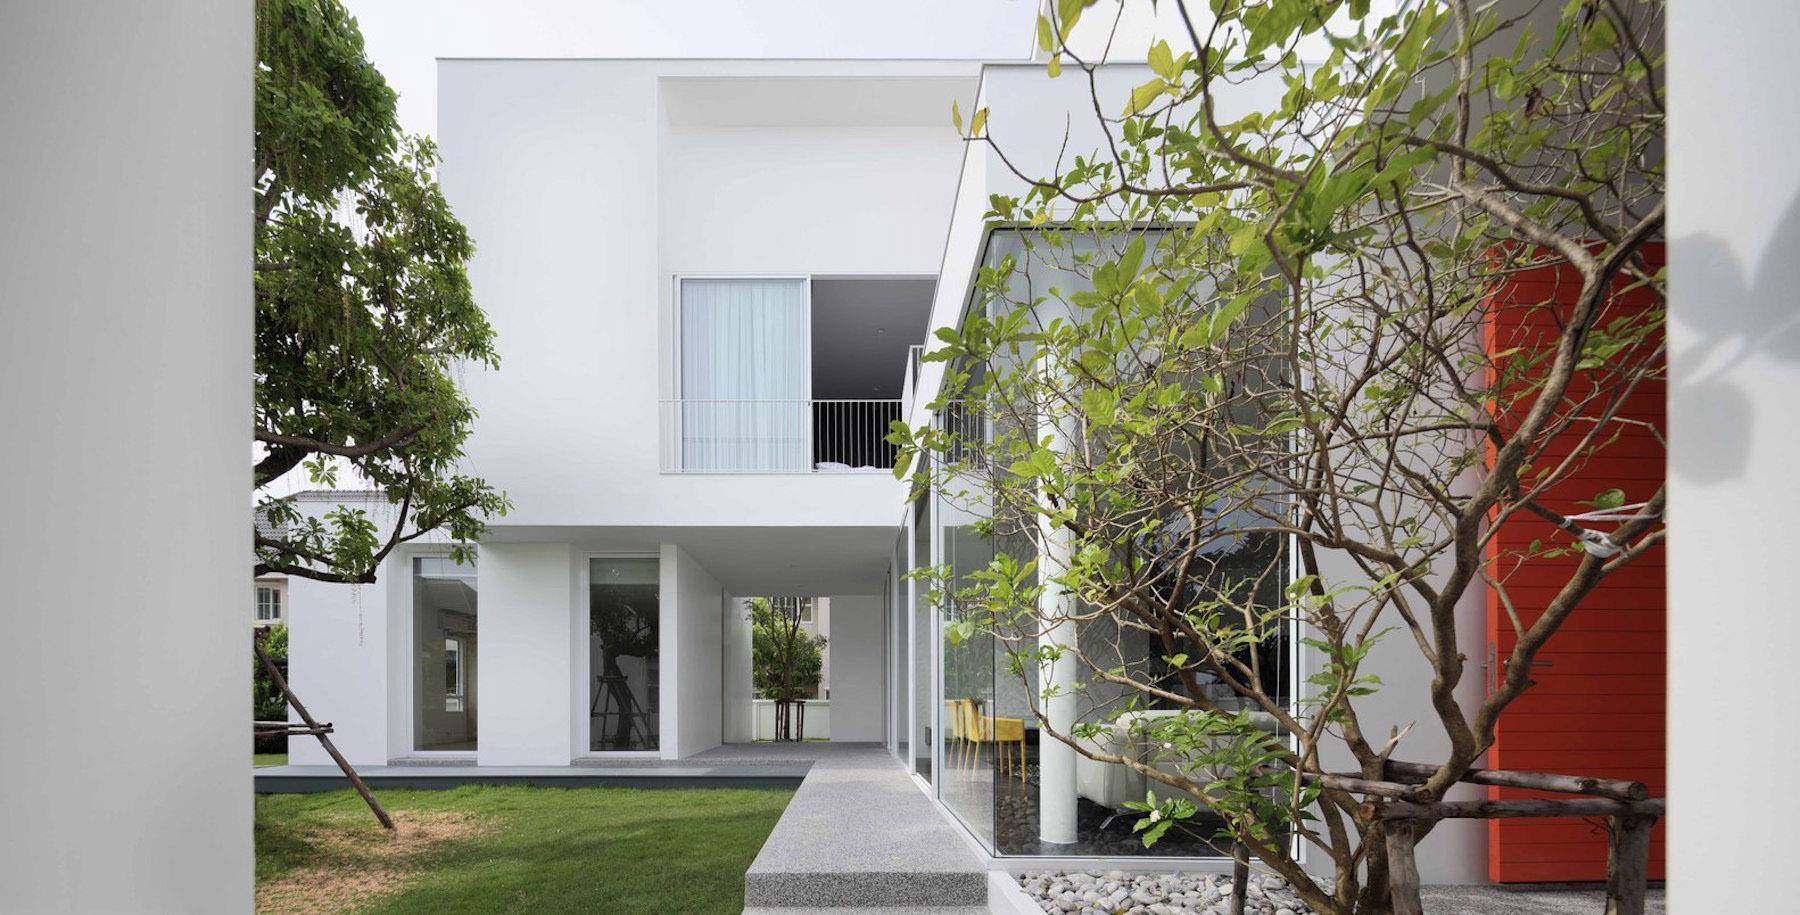 iGNANT-Architecture-Ayutt-And-Associates-Design-White-Box-House-24